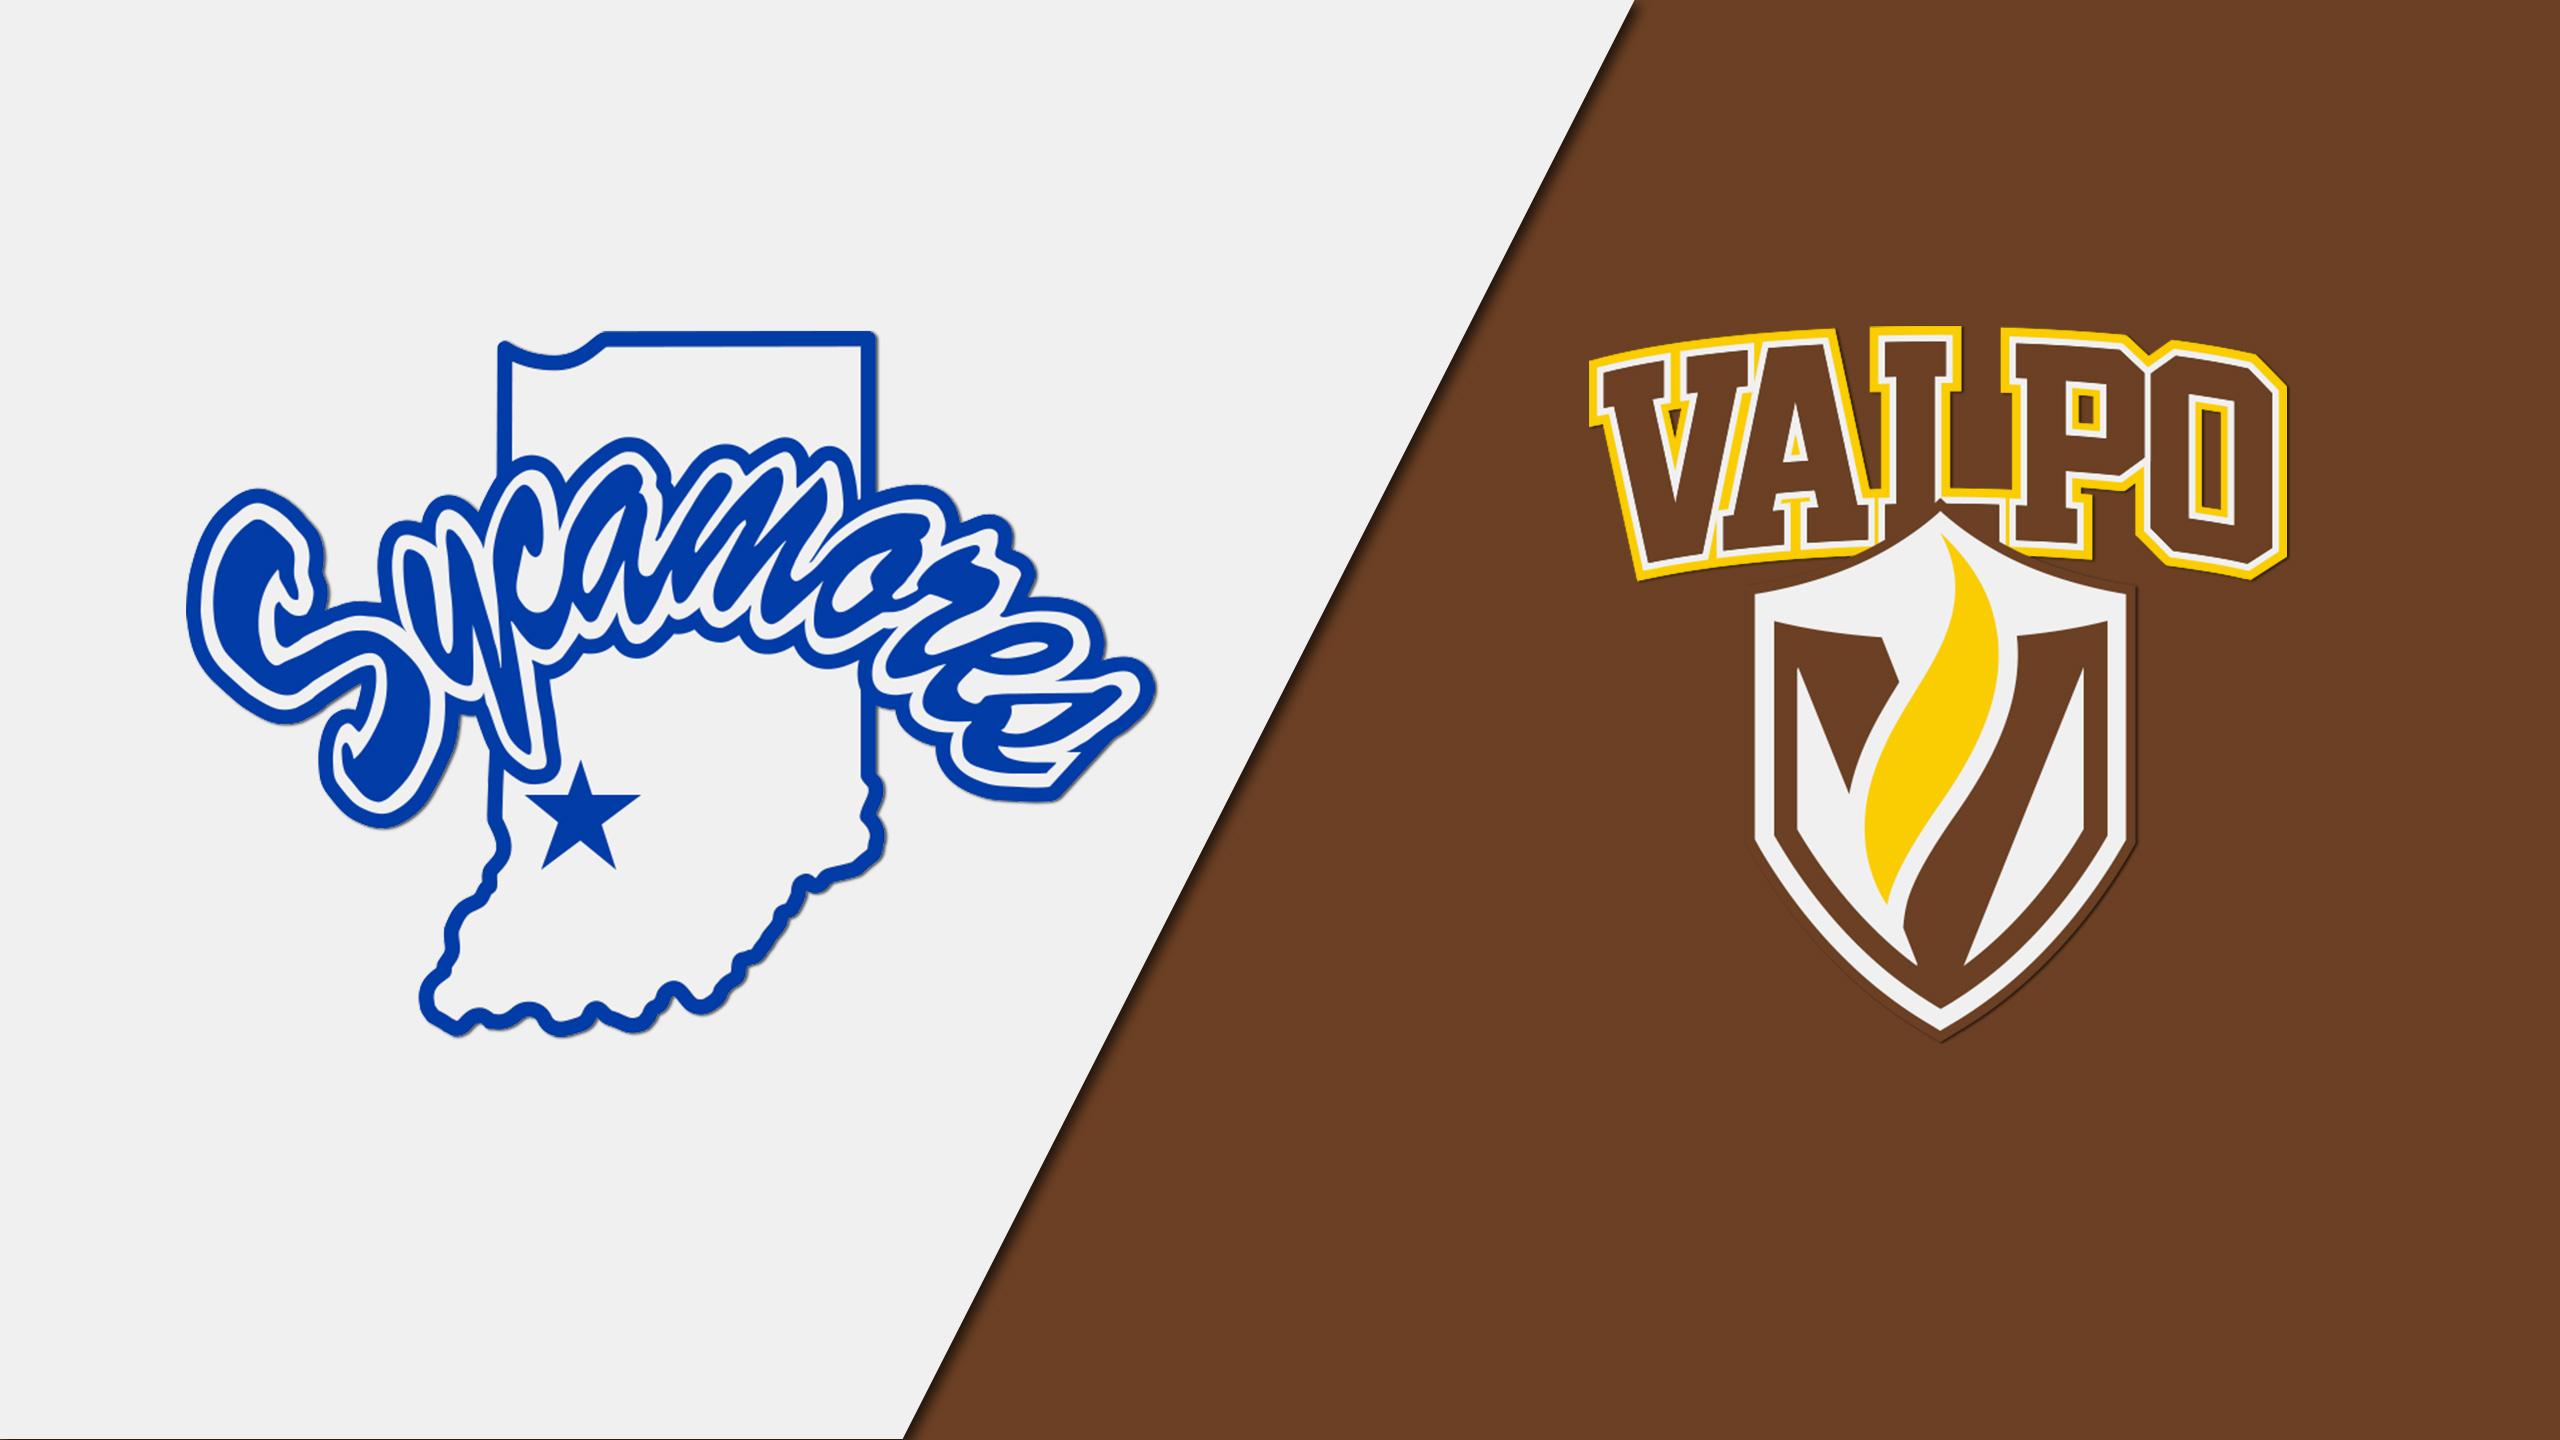 Indiana State vs. Valparaiso (M Basketball)